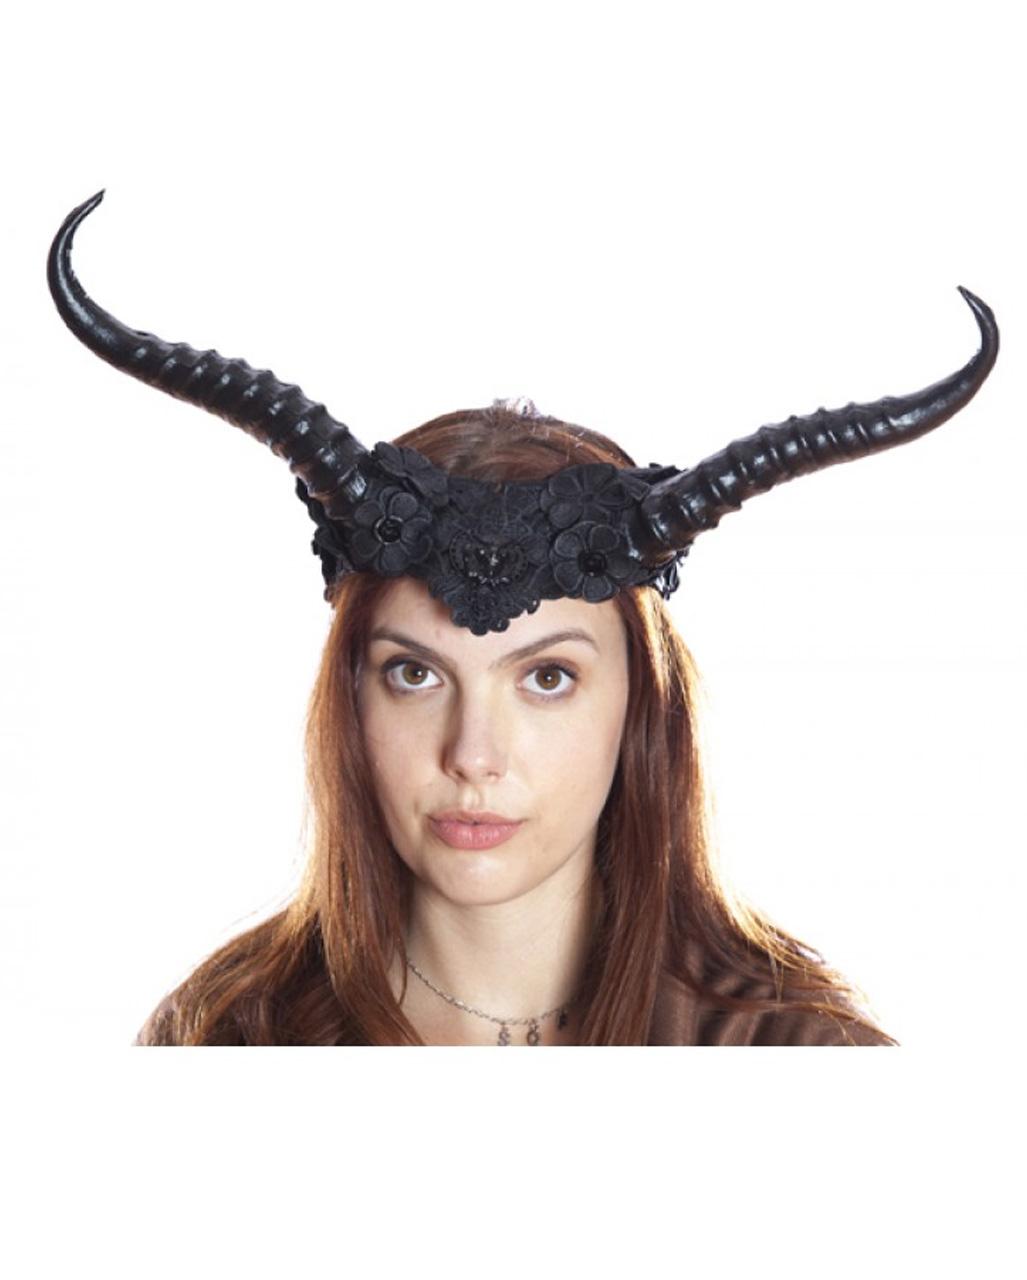 Demonic Queen Black and Lace Horn Headband Halloween Horror Ladies Fancy Dress